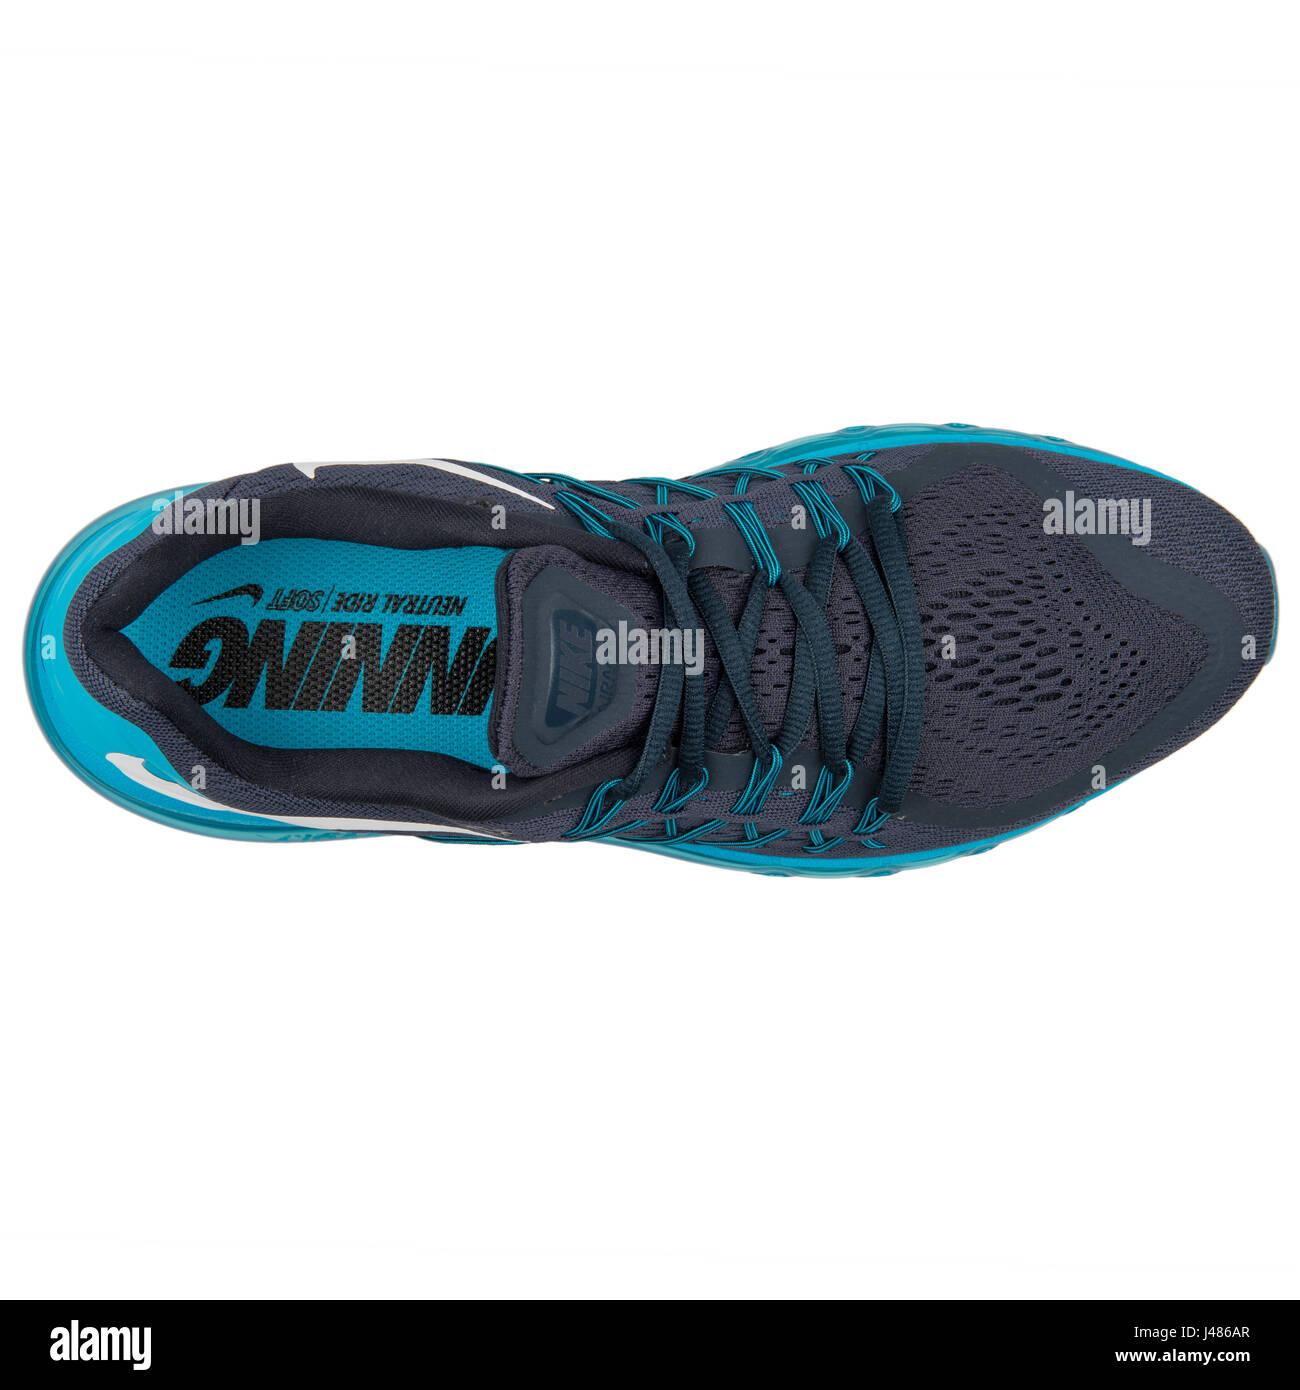 Nike Kicks Sneakers Stockfotos & Nike Kicks Sneakers Bilder